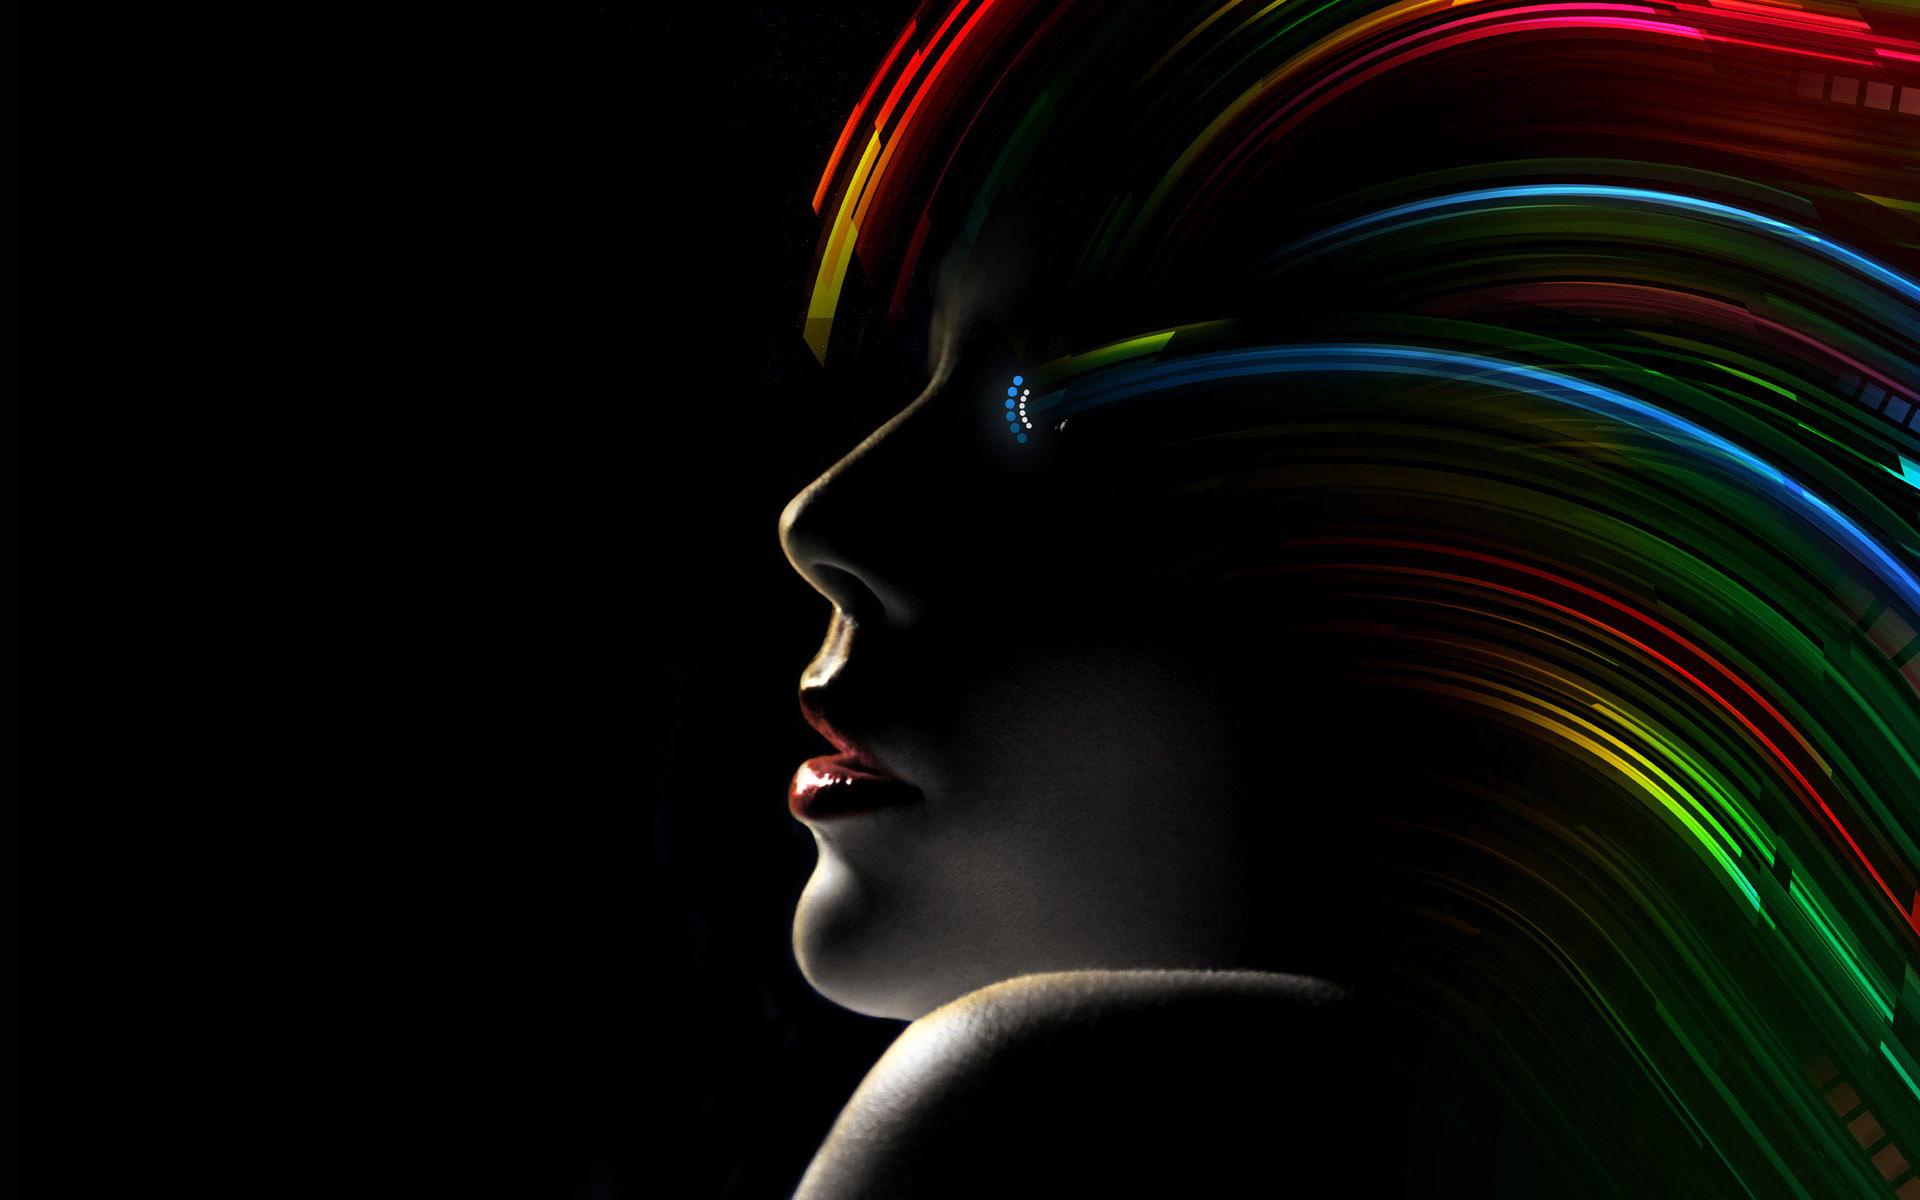 techno rainbow background - photo #26